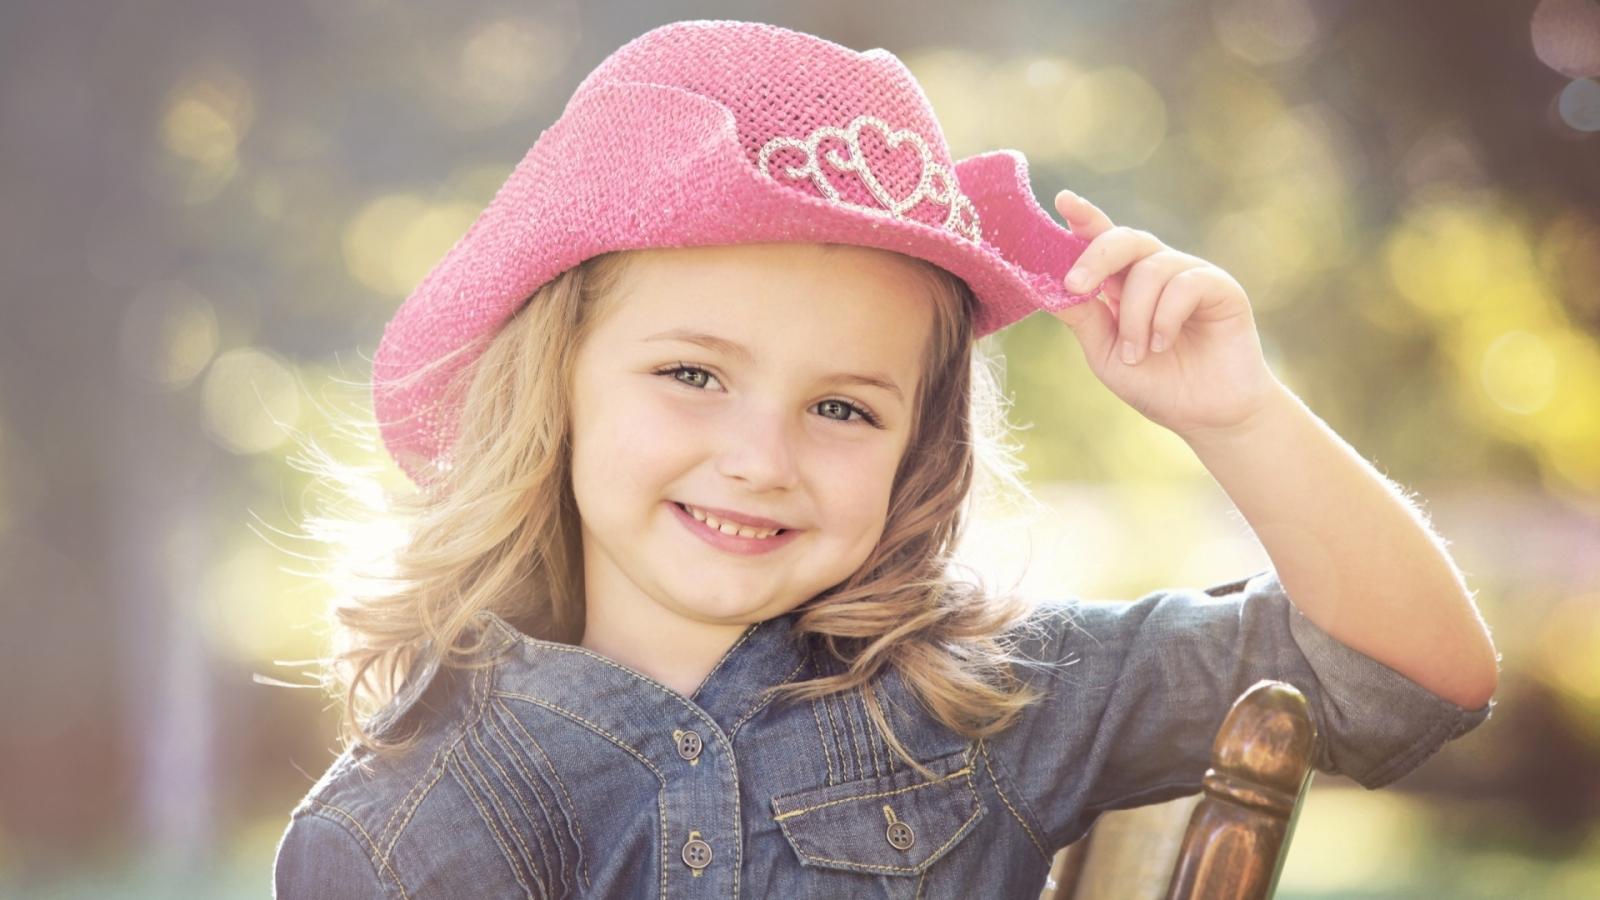 beautiful cute baby girls hd wallpapers top background desktop baby 1600x900